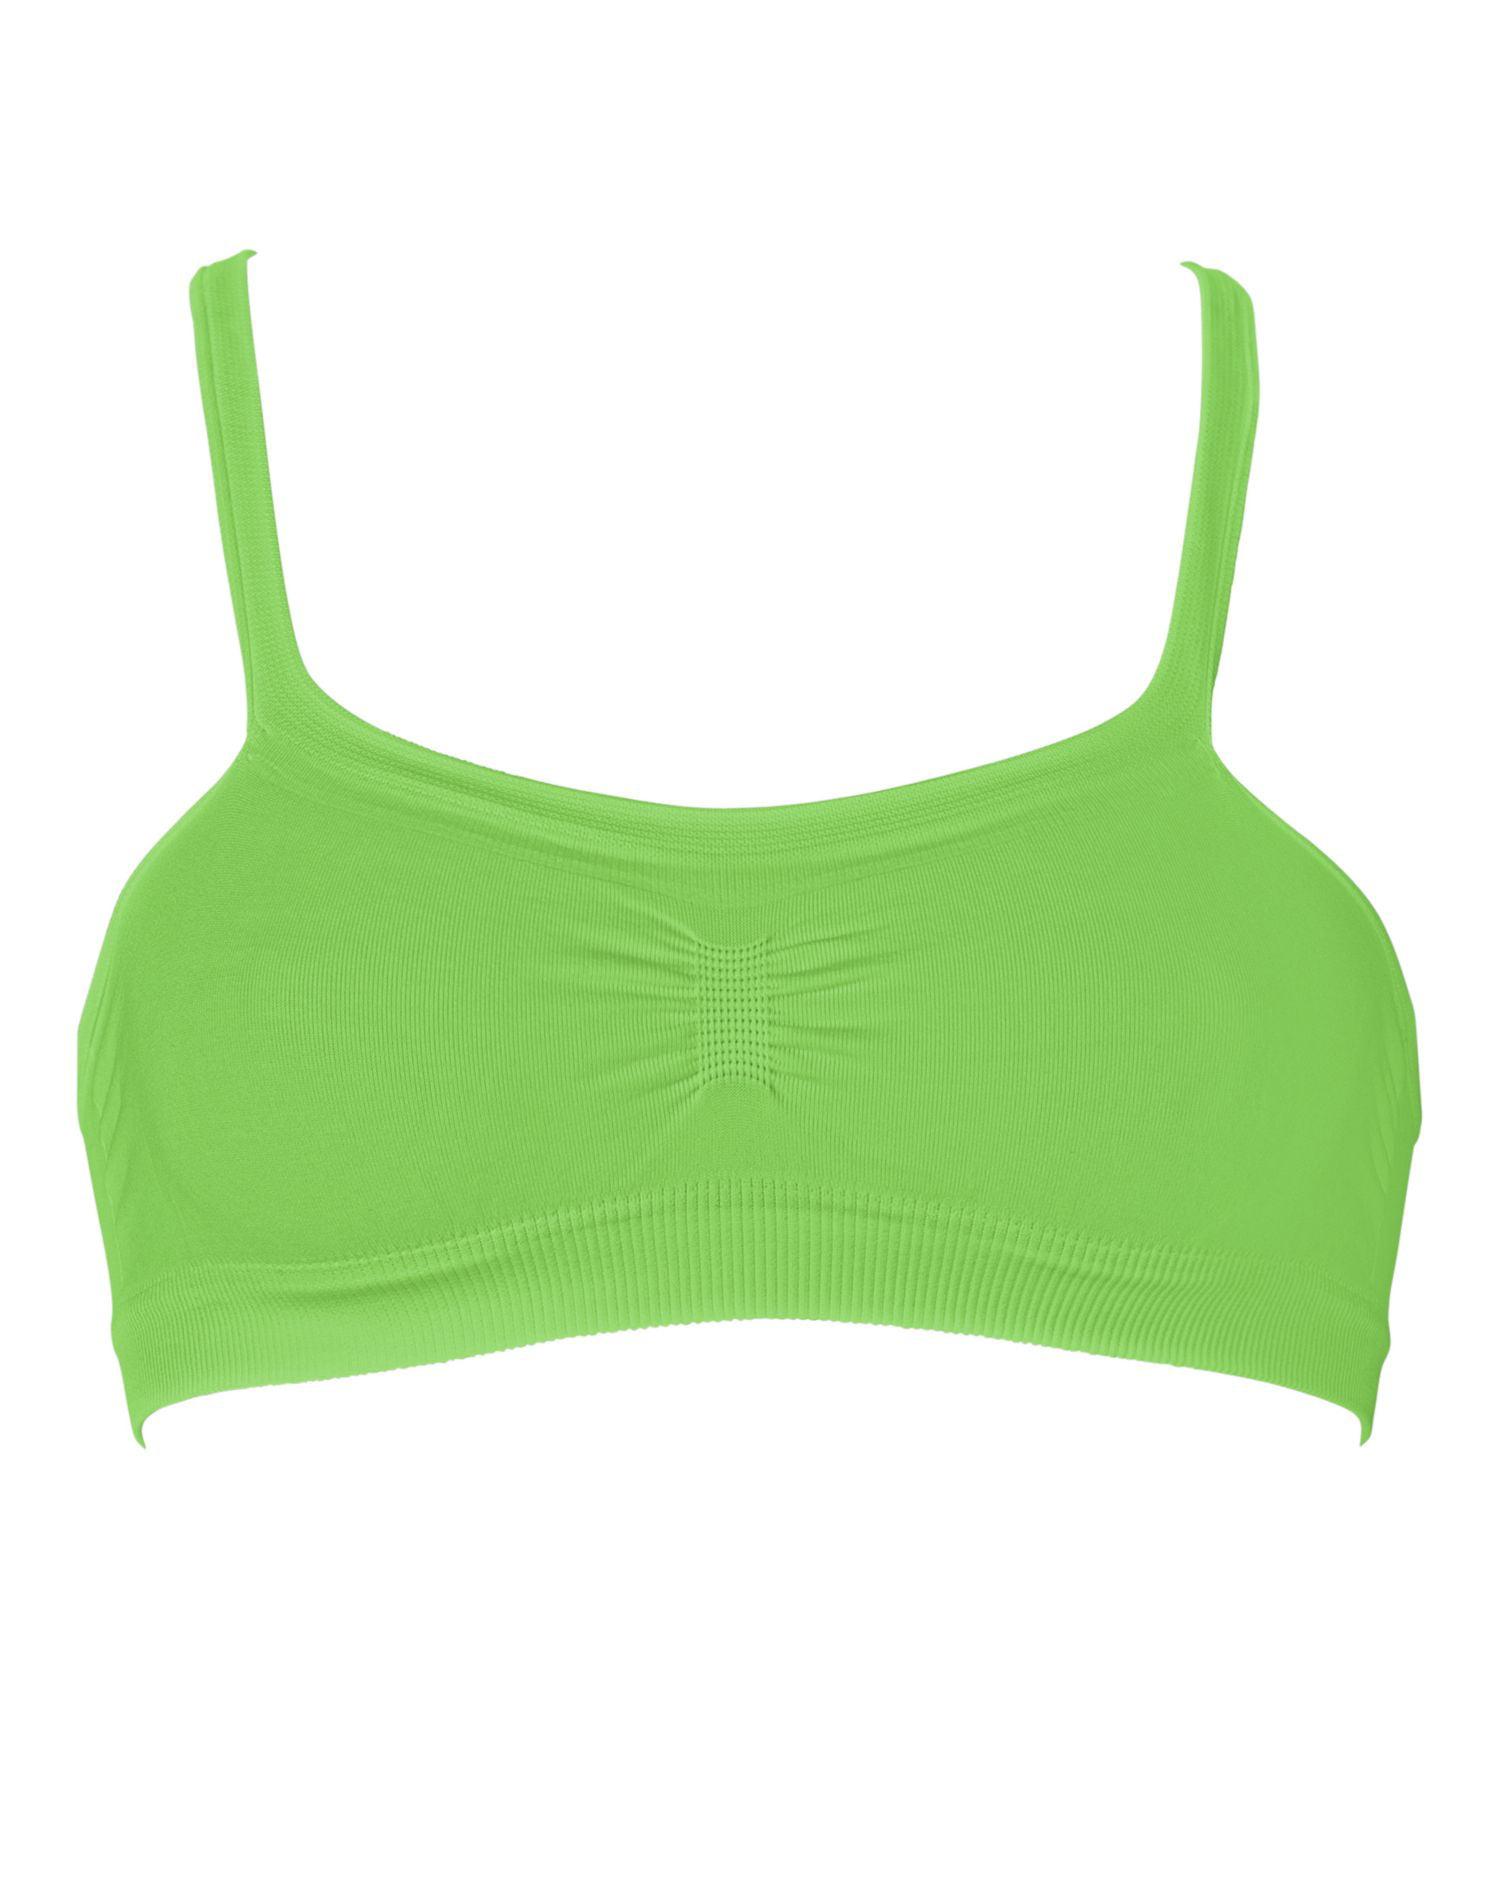 Hanes - Hanes Girls` Seamless The Bandini - Best-Seller, H134, XL, Nude/Navy  Glisten - Walmart.com